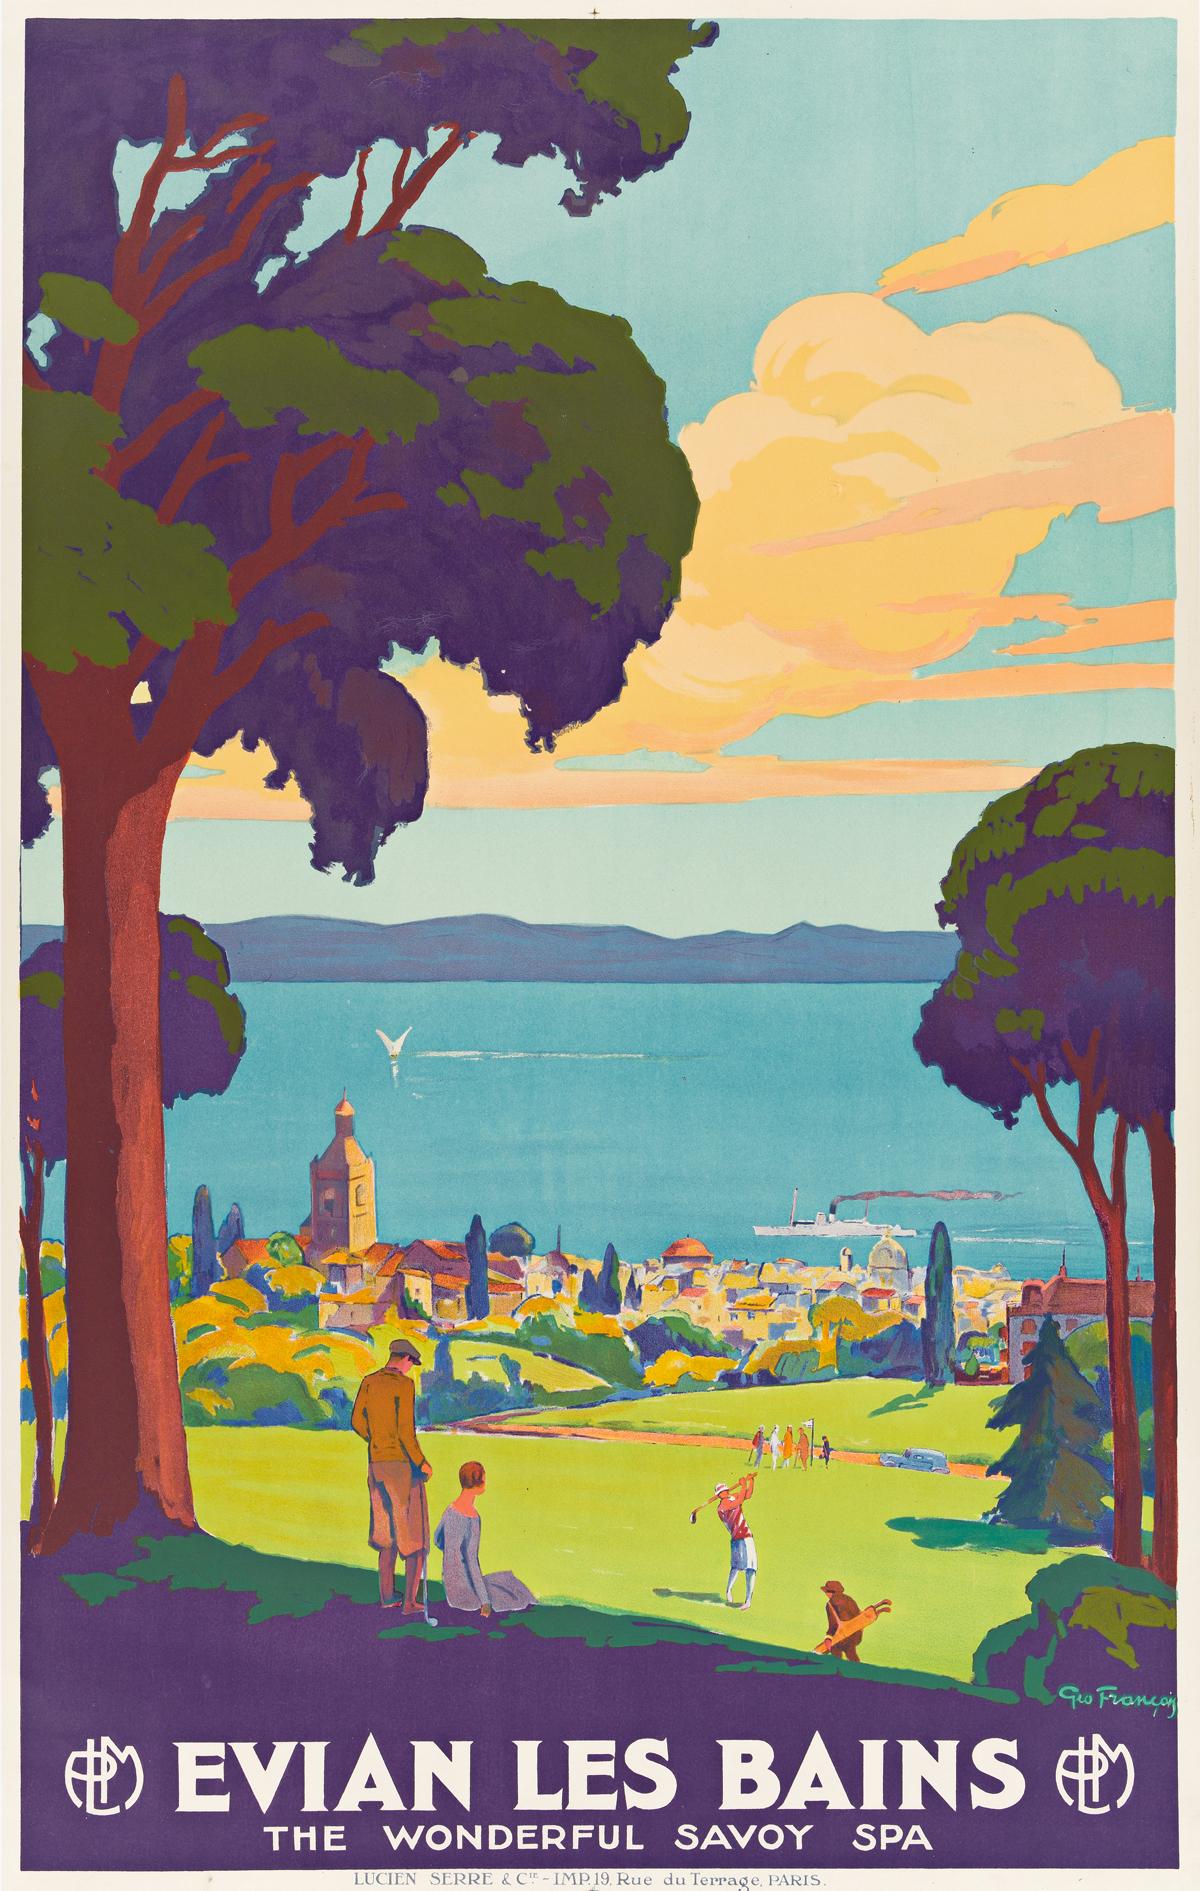 GÉO FRANÇOIS (1880-1968).  EVIAN LES BAINS / THE WONDERFUL SAVOY SPA. Circa 1930. 39¾x25 inches, 101x63½ cm. Lucien Serre & Cie., Paris